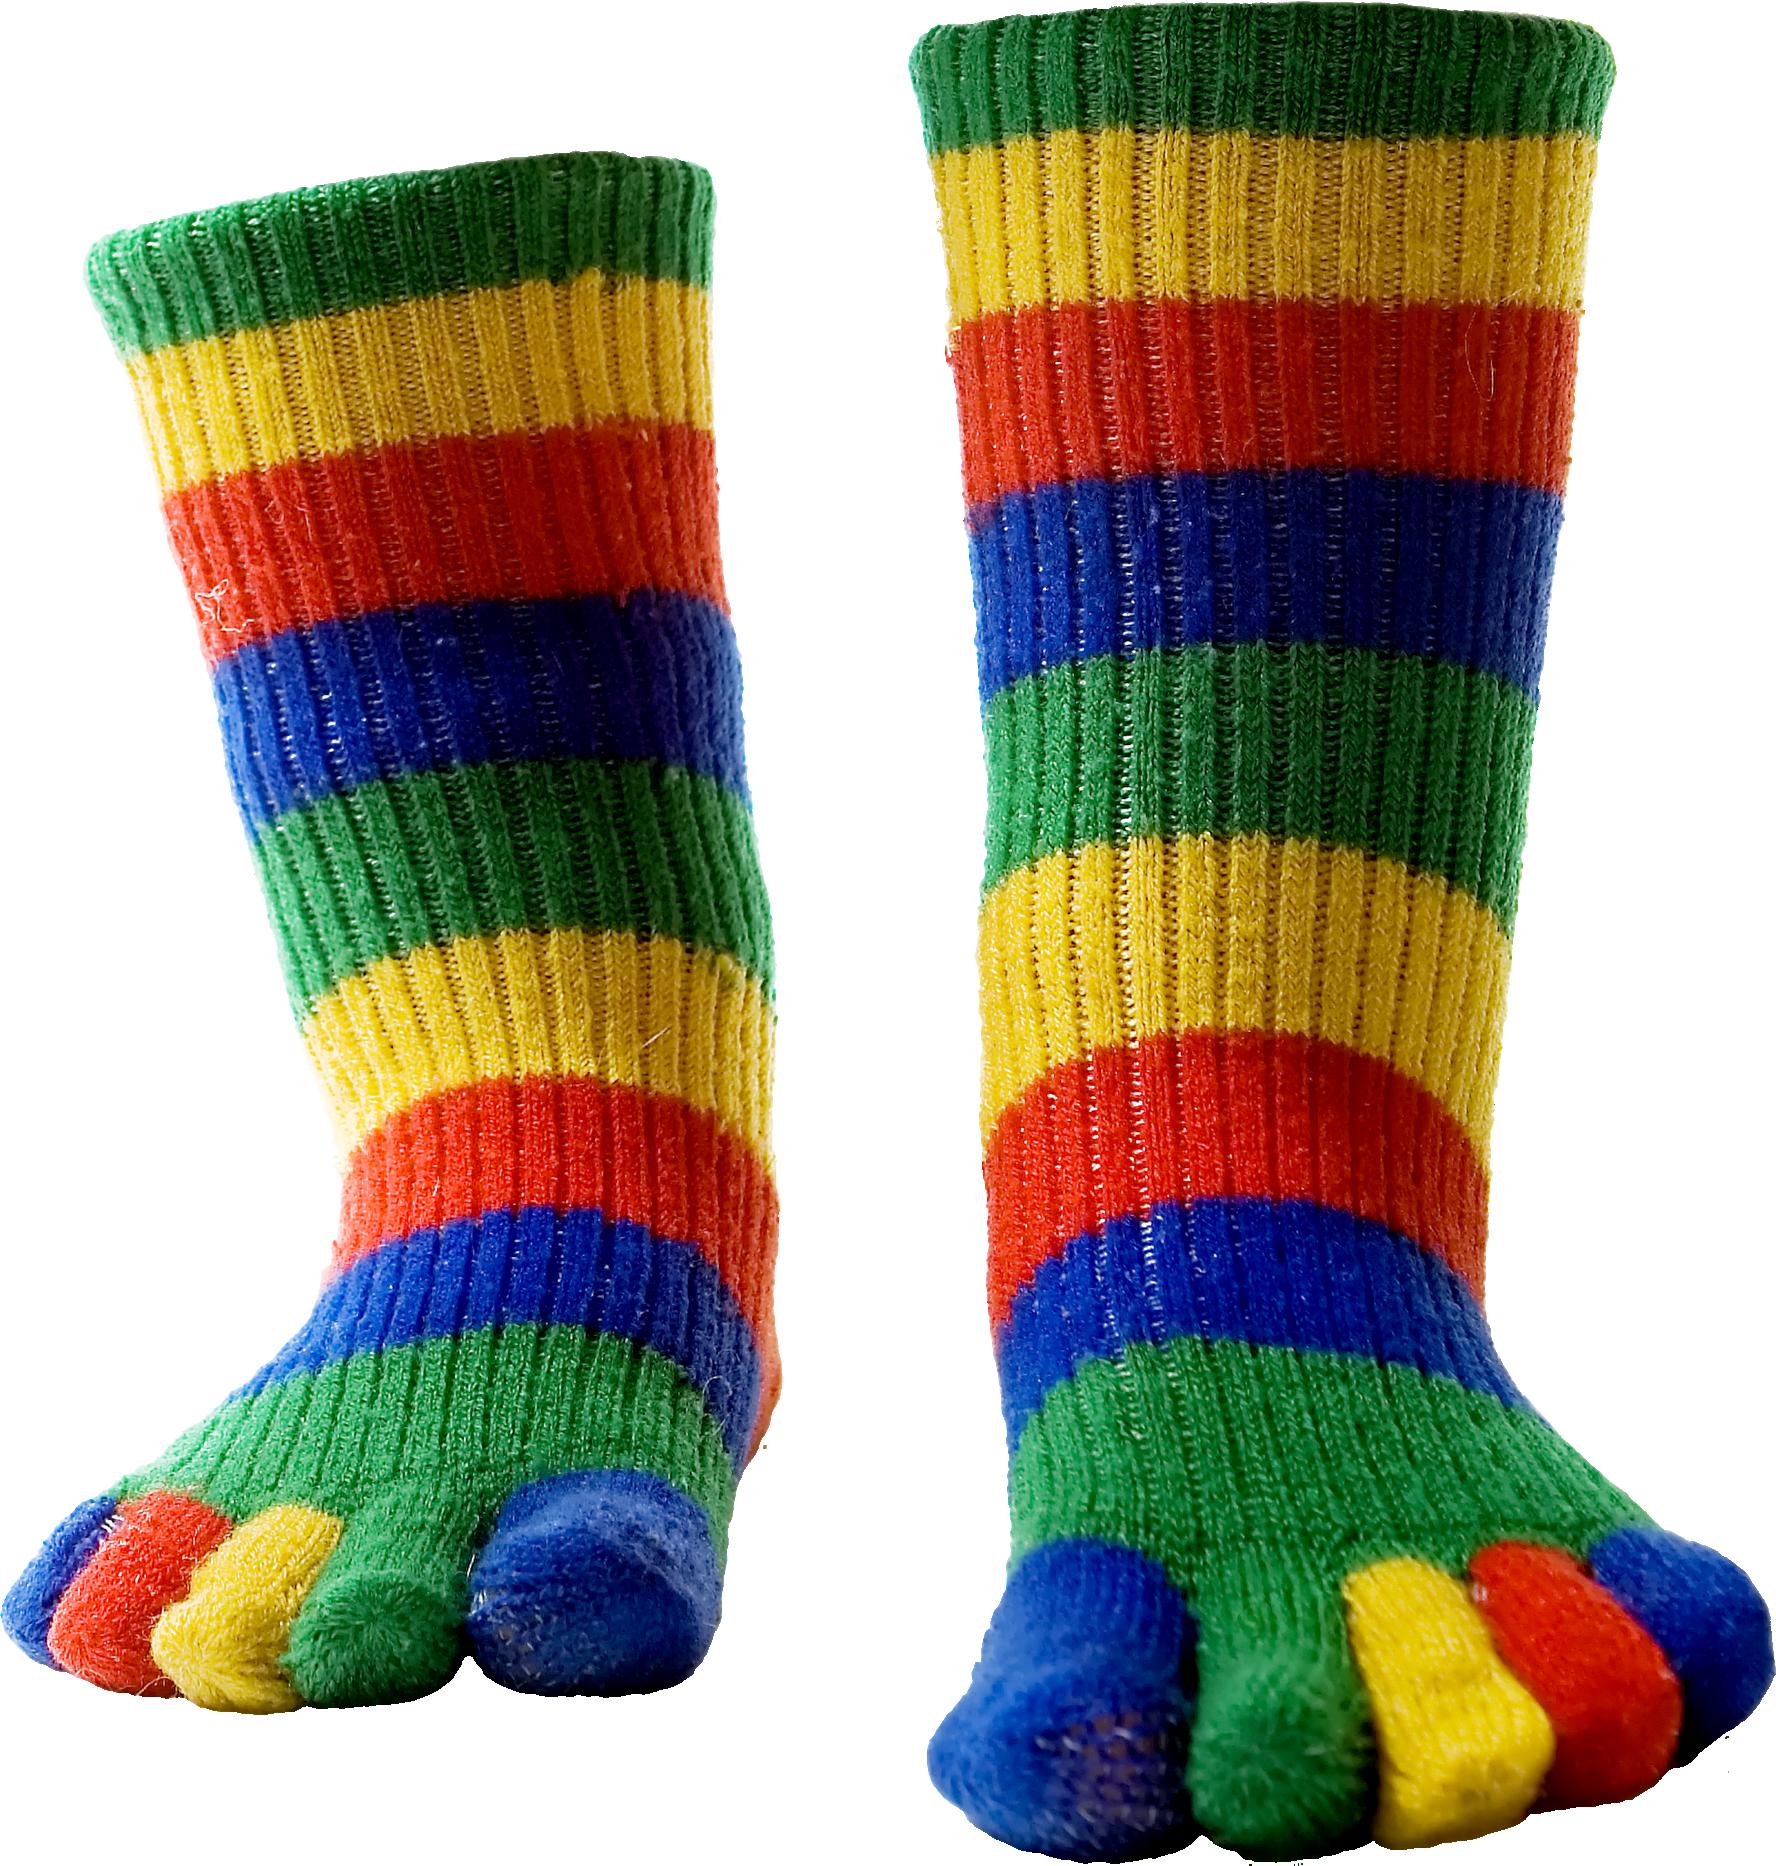 Sock colourful sock